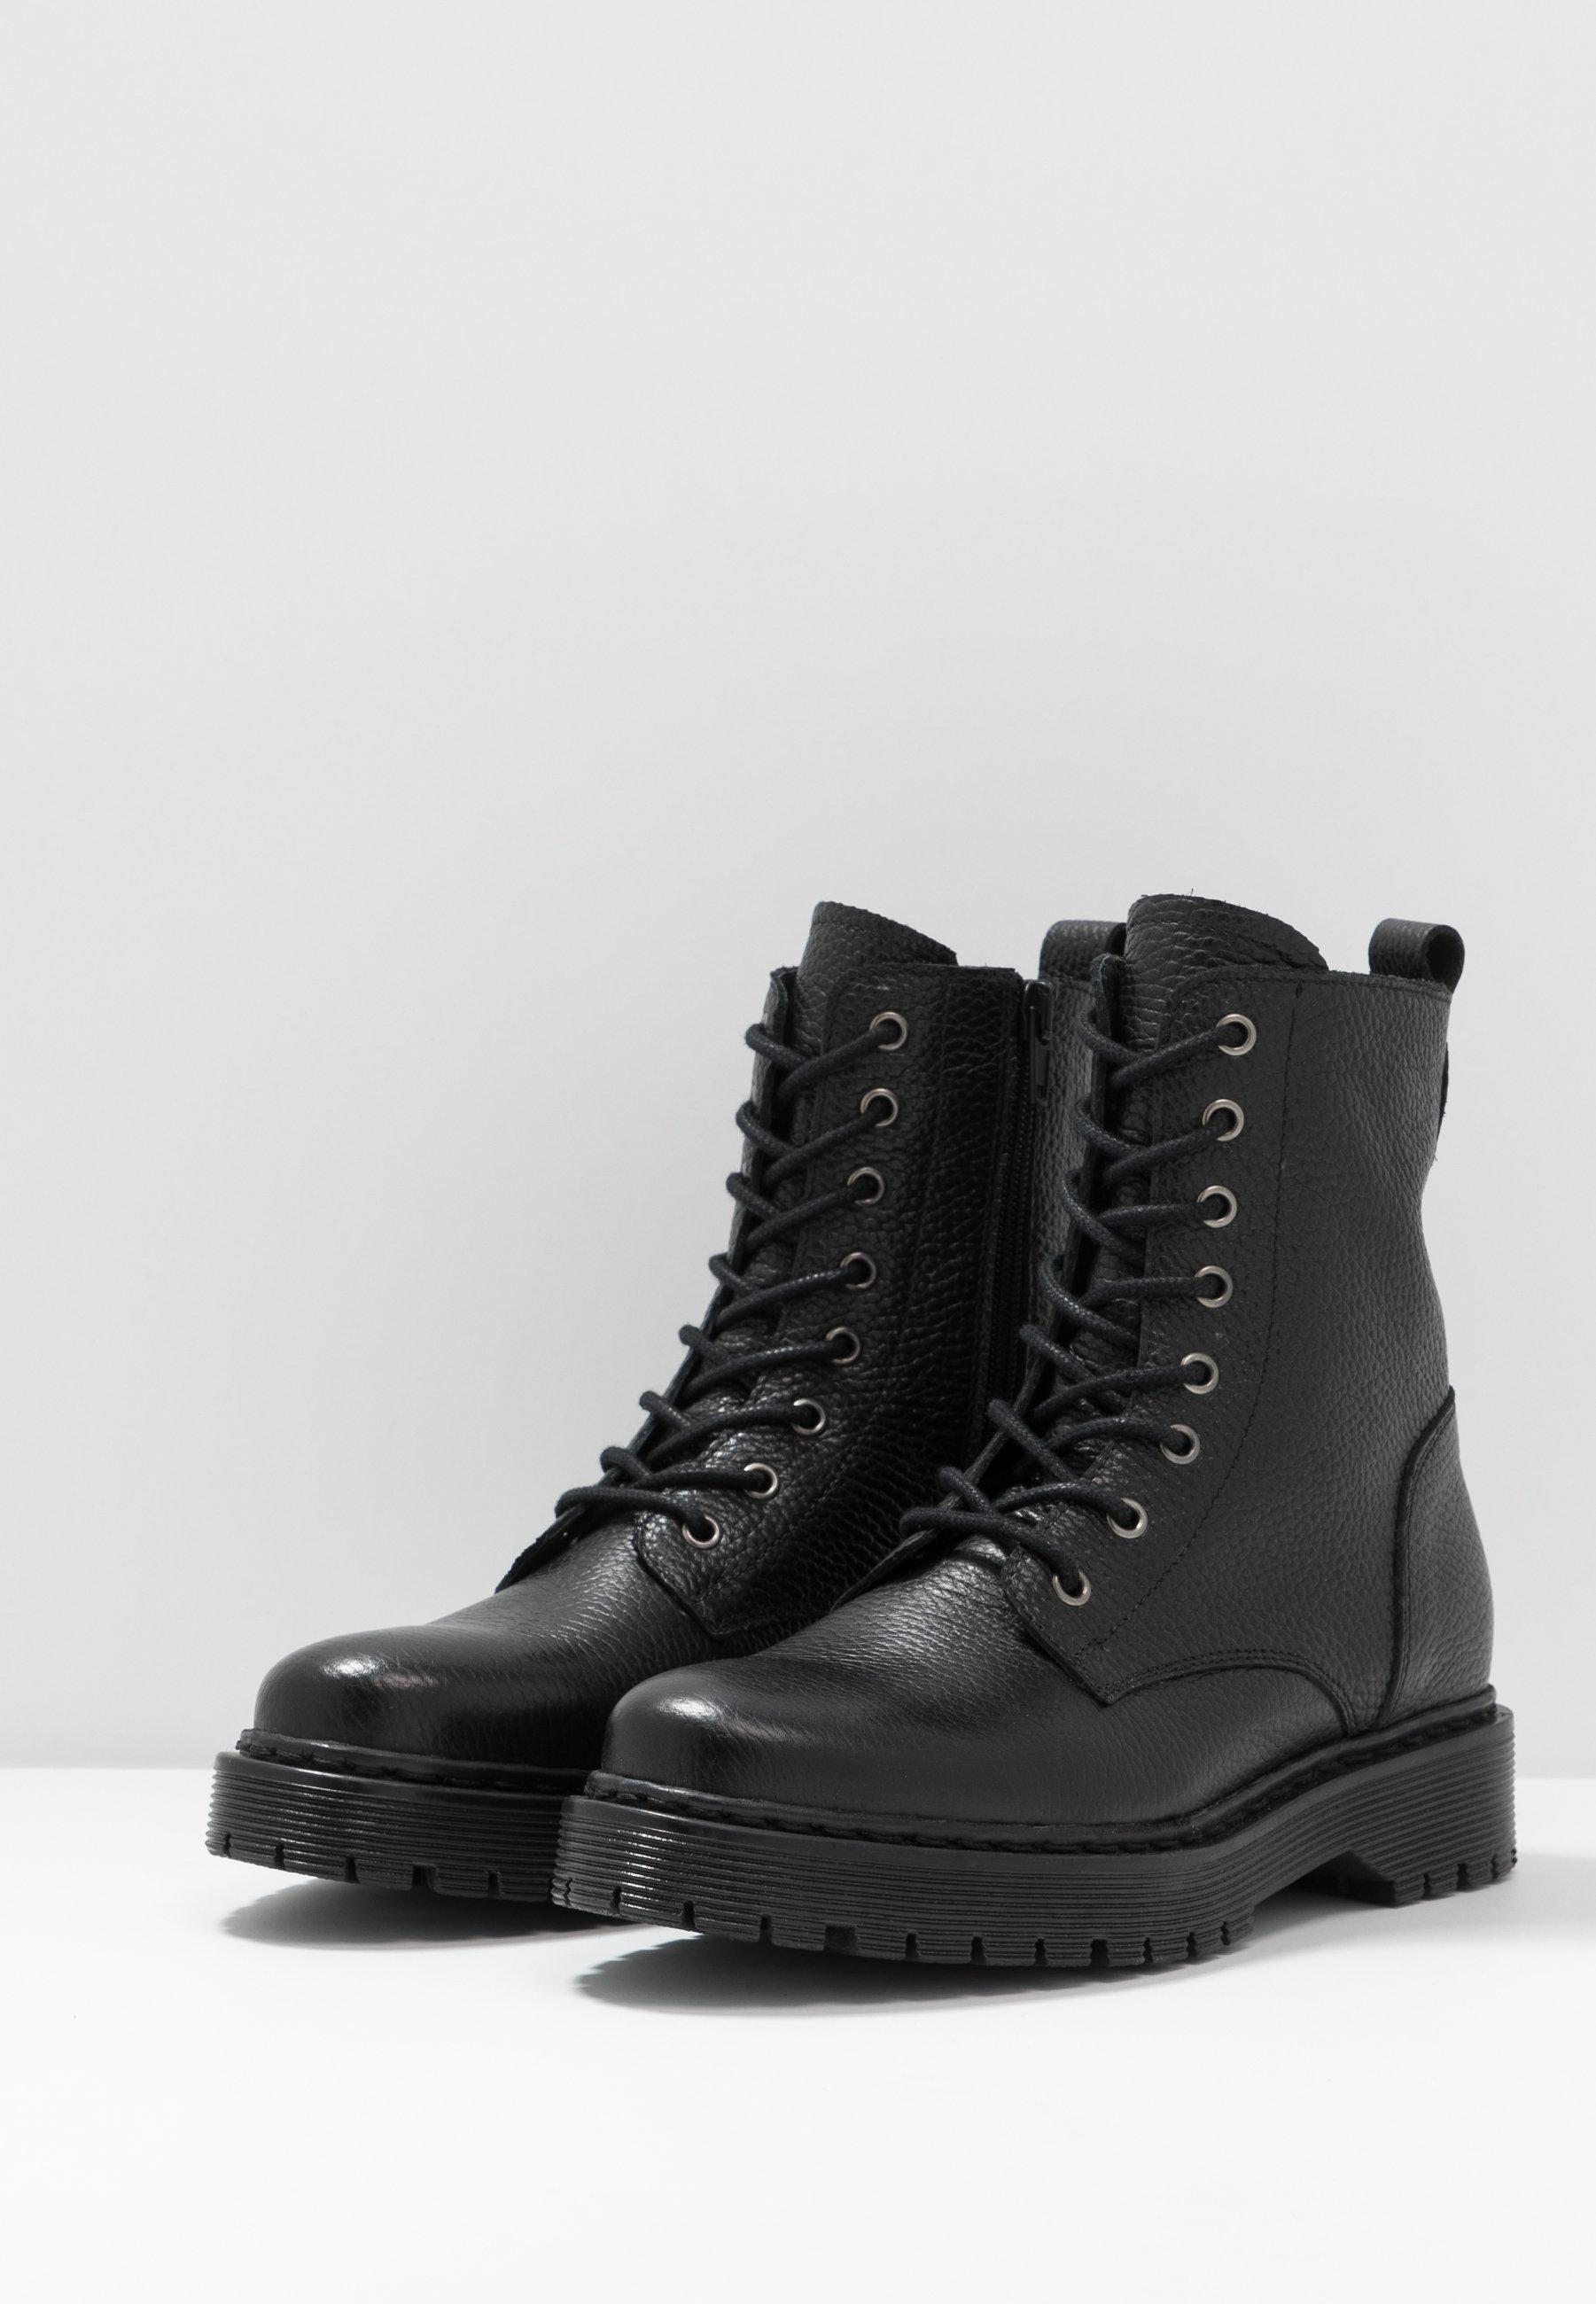 Zign Schnürstiefelette - black | Damen Schuhe 2020